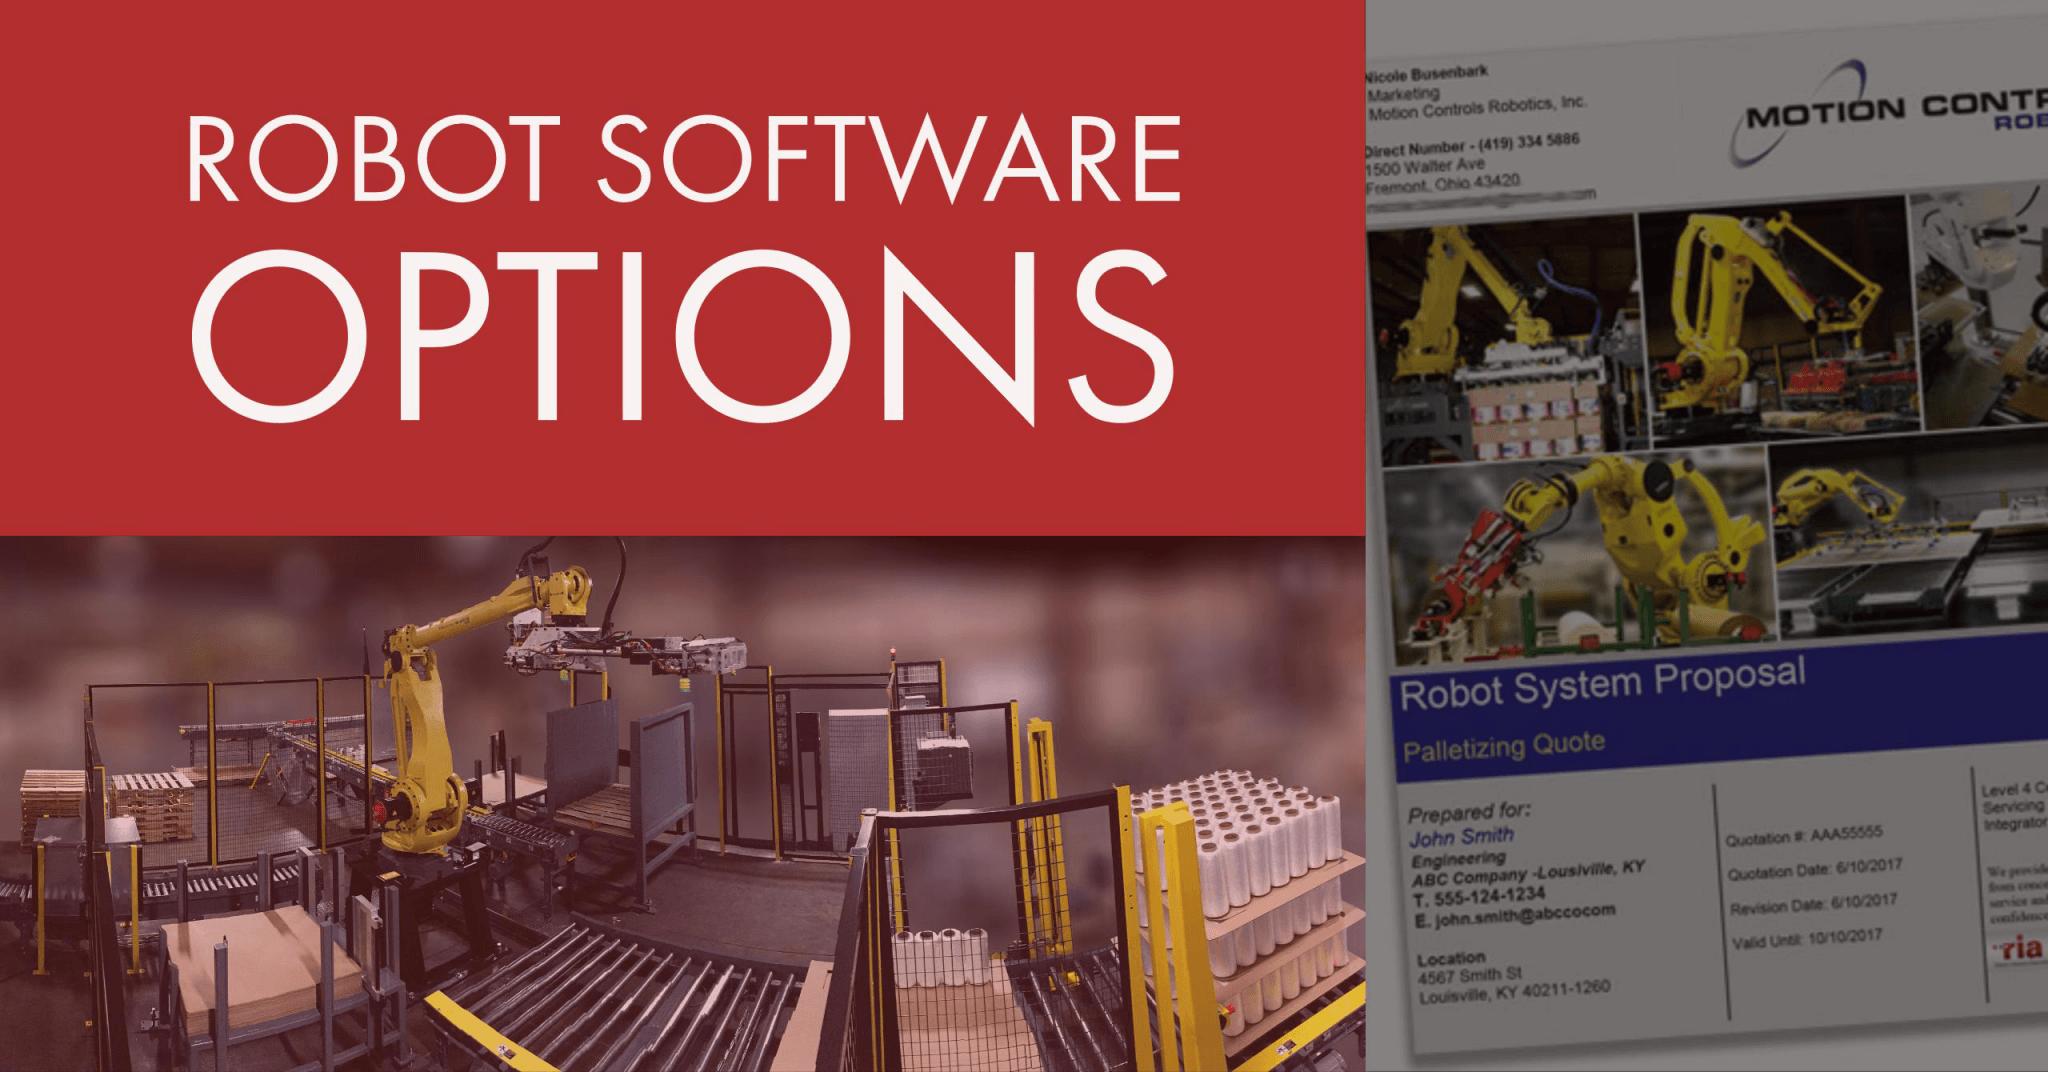 why do you need fanuc robot software options motion controls robotics rh motioncontrolsrobotics com Fanuc Sealing Fanuc Handling Tool Manual